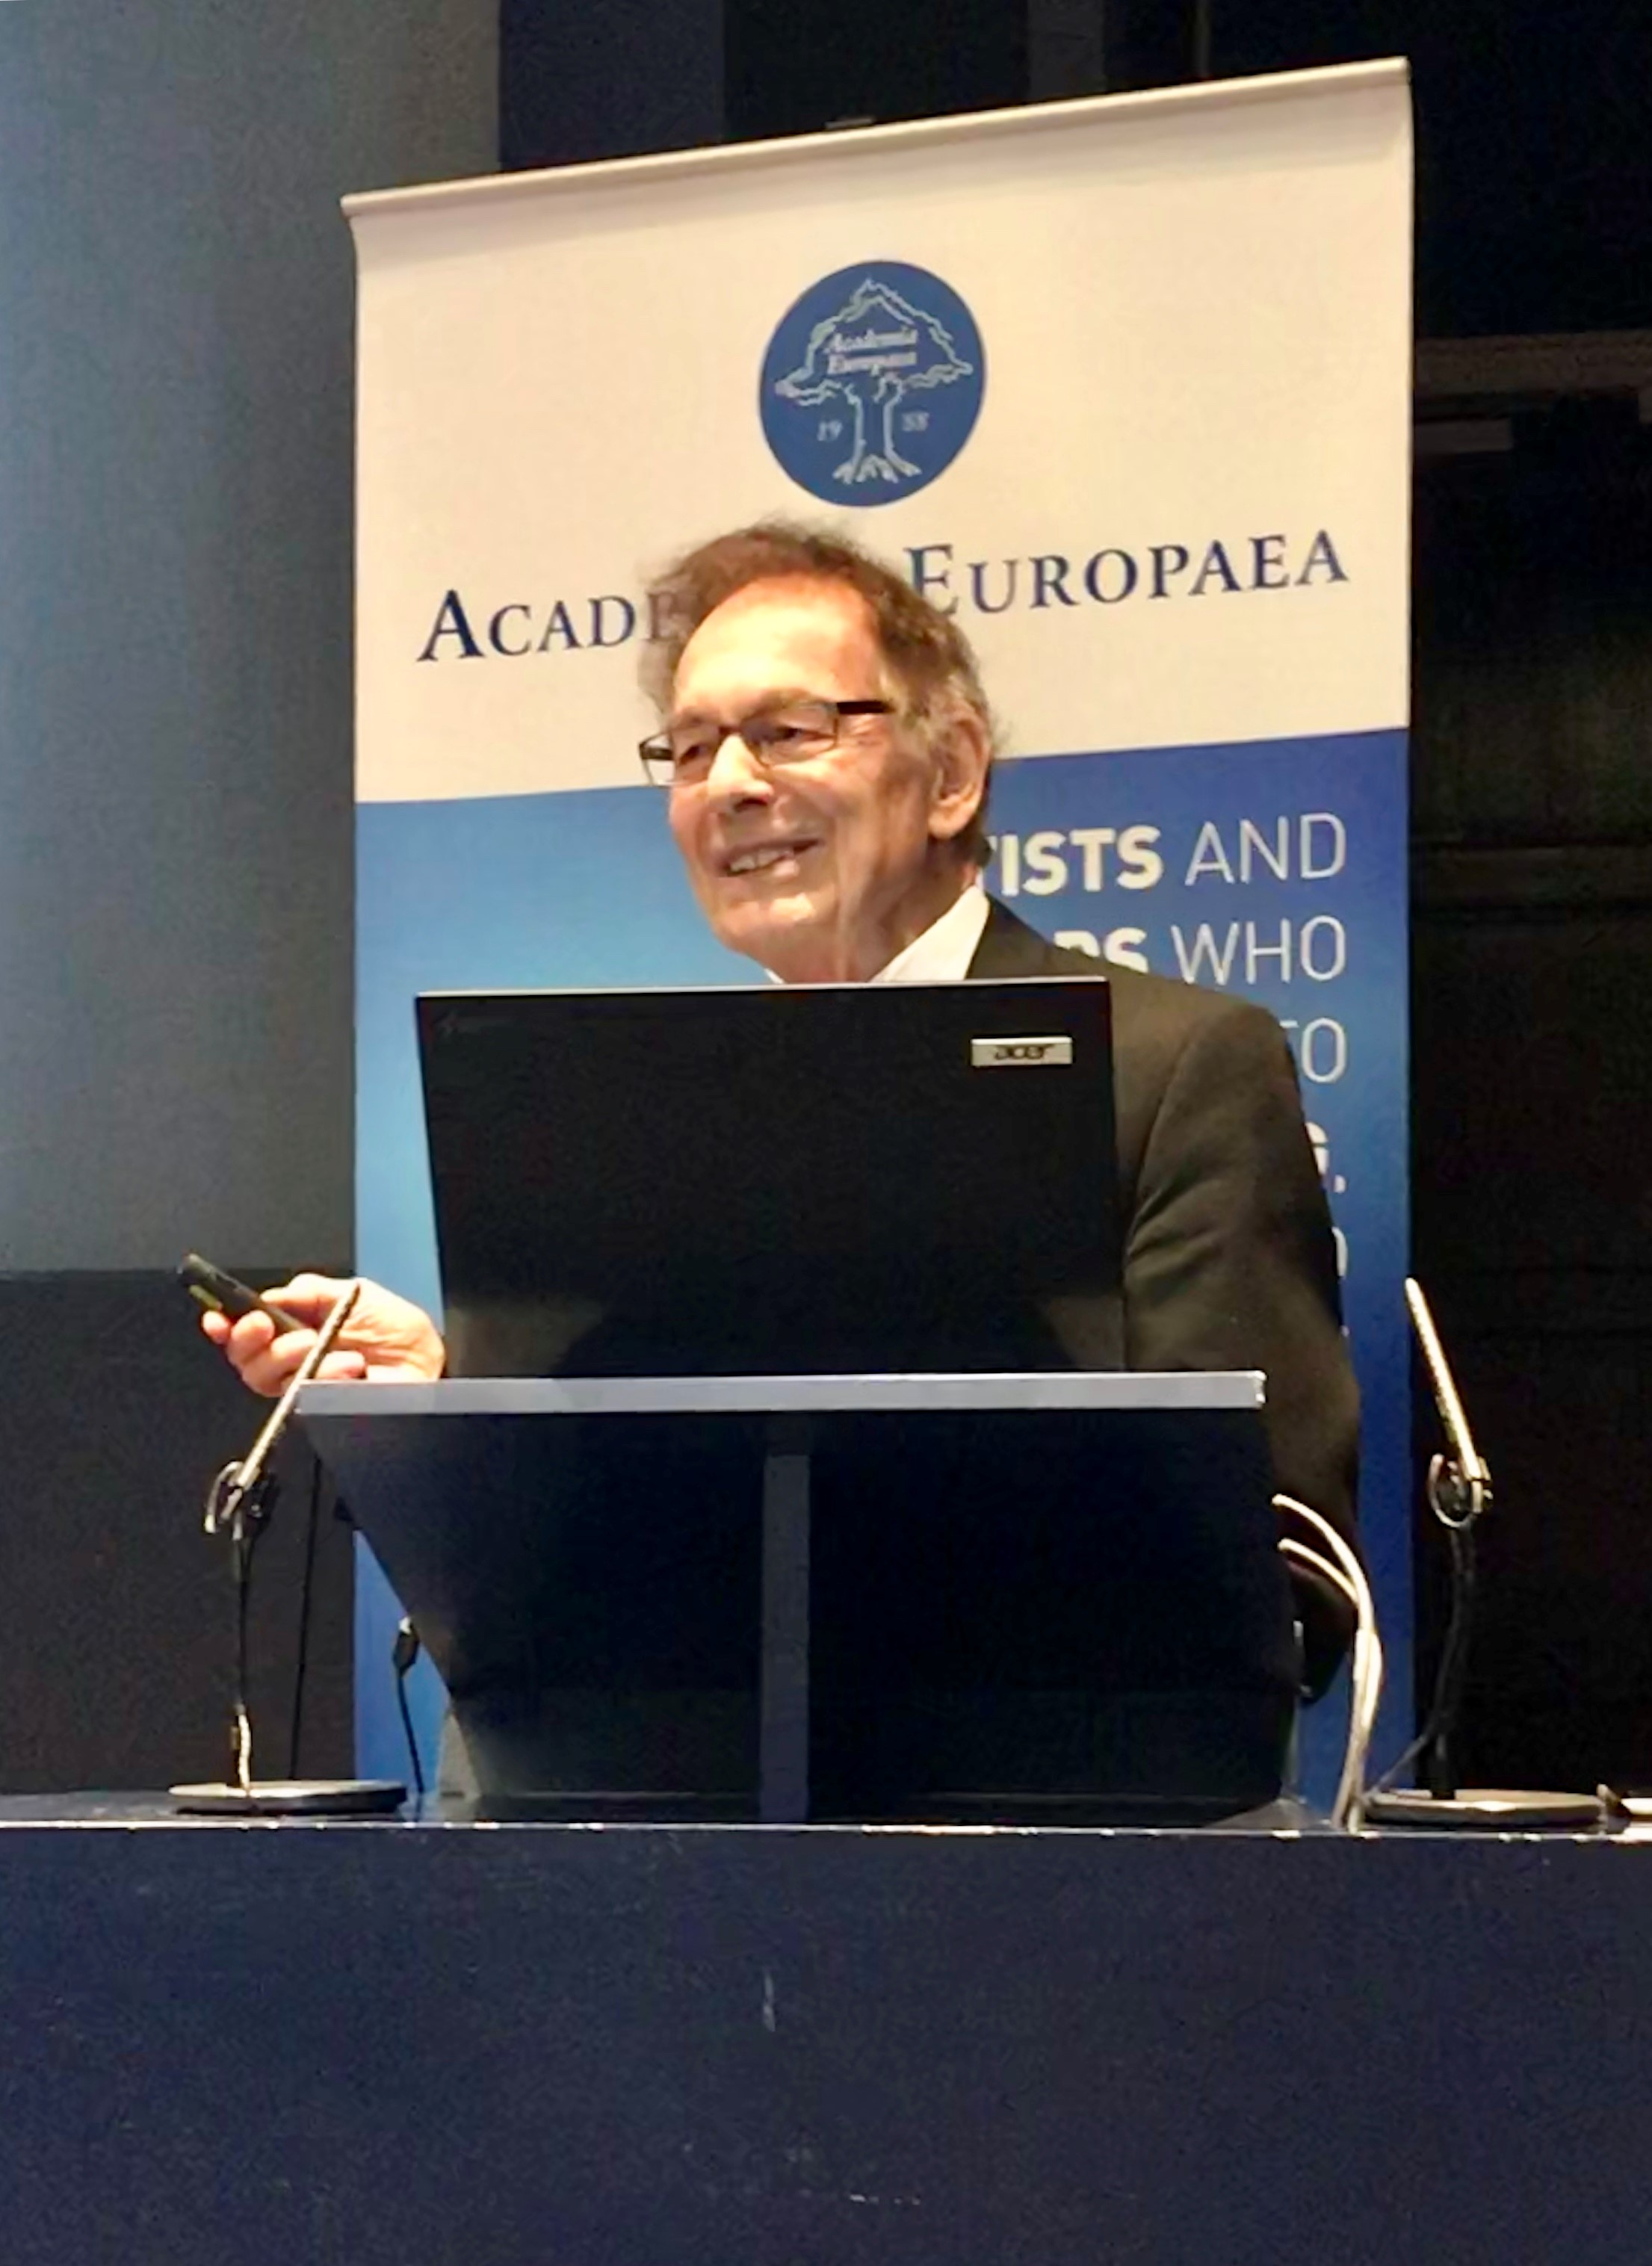 Professor Alexander Boksenberg, University of Cambridge, presenting on observational astronomy